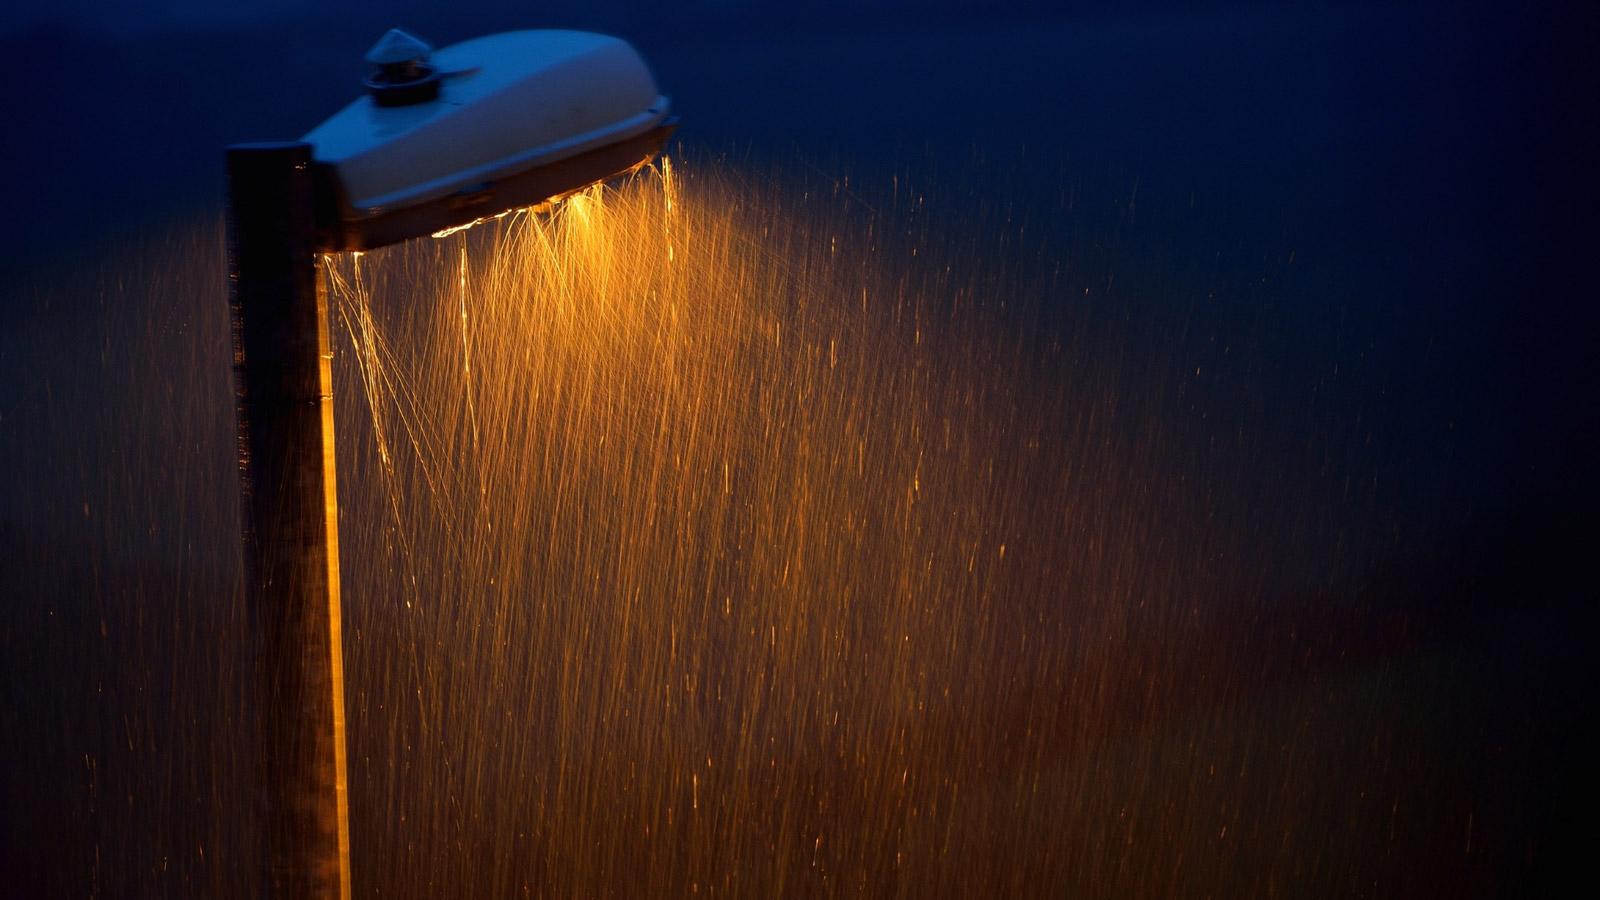 Рой Кертис / Roy Curtis, Фотоконкурс RMetS / RPS Weather